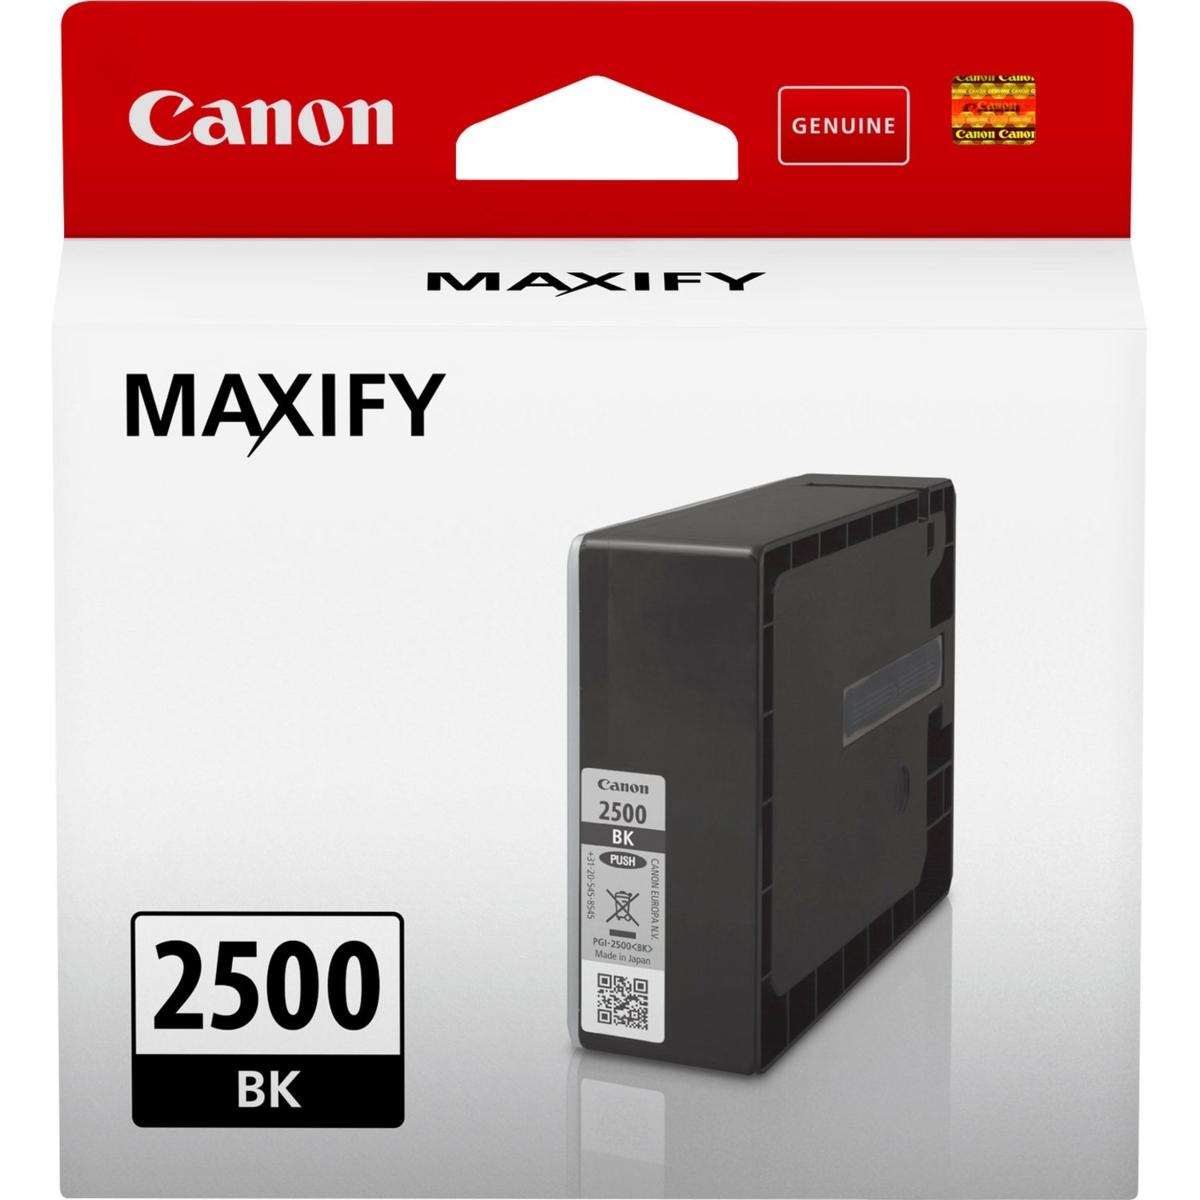 Cartridge Canon PGI-2500 BK, 9290B001 - originálny (Čierna)